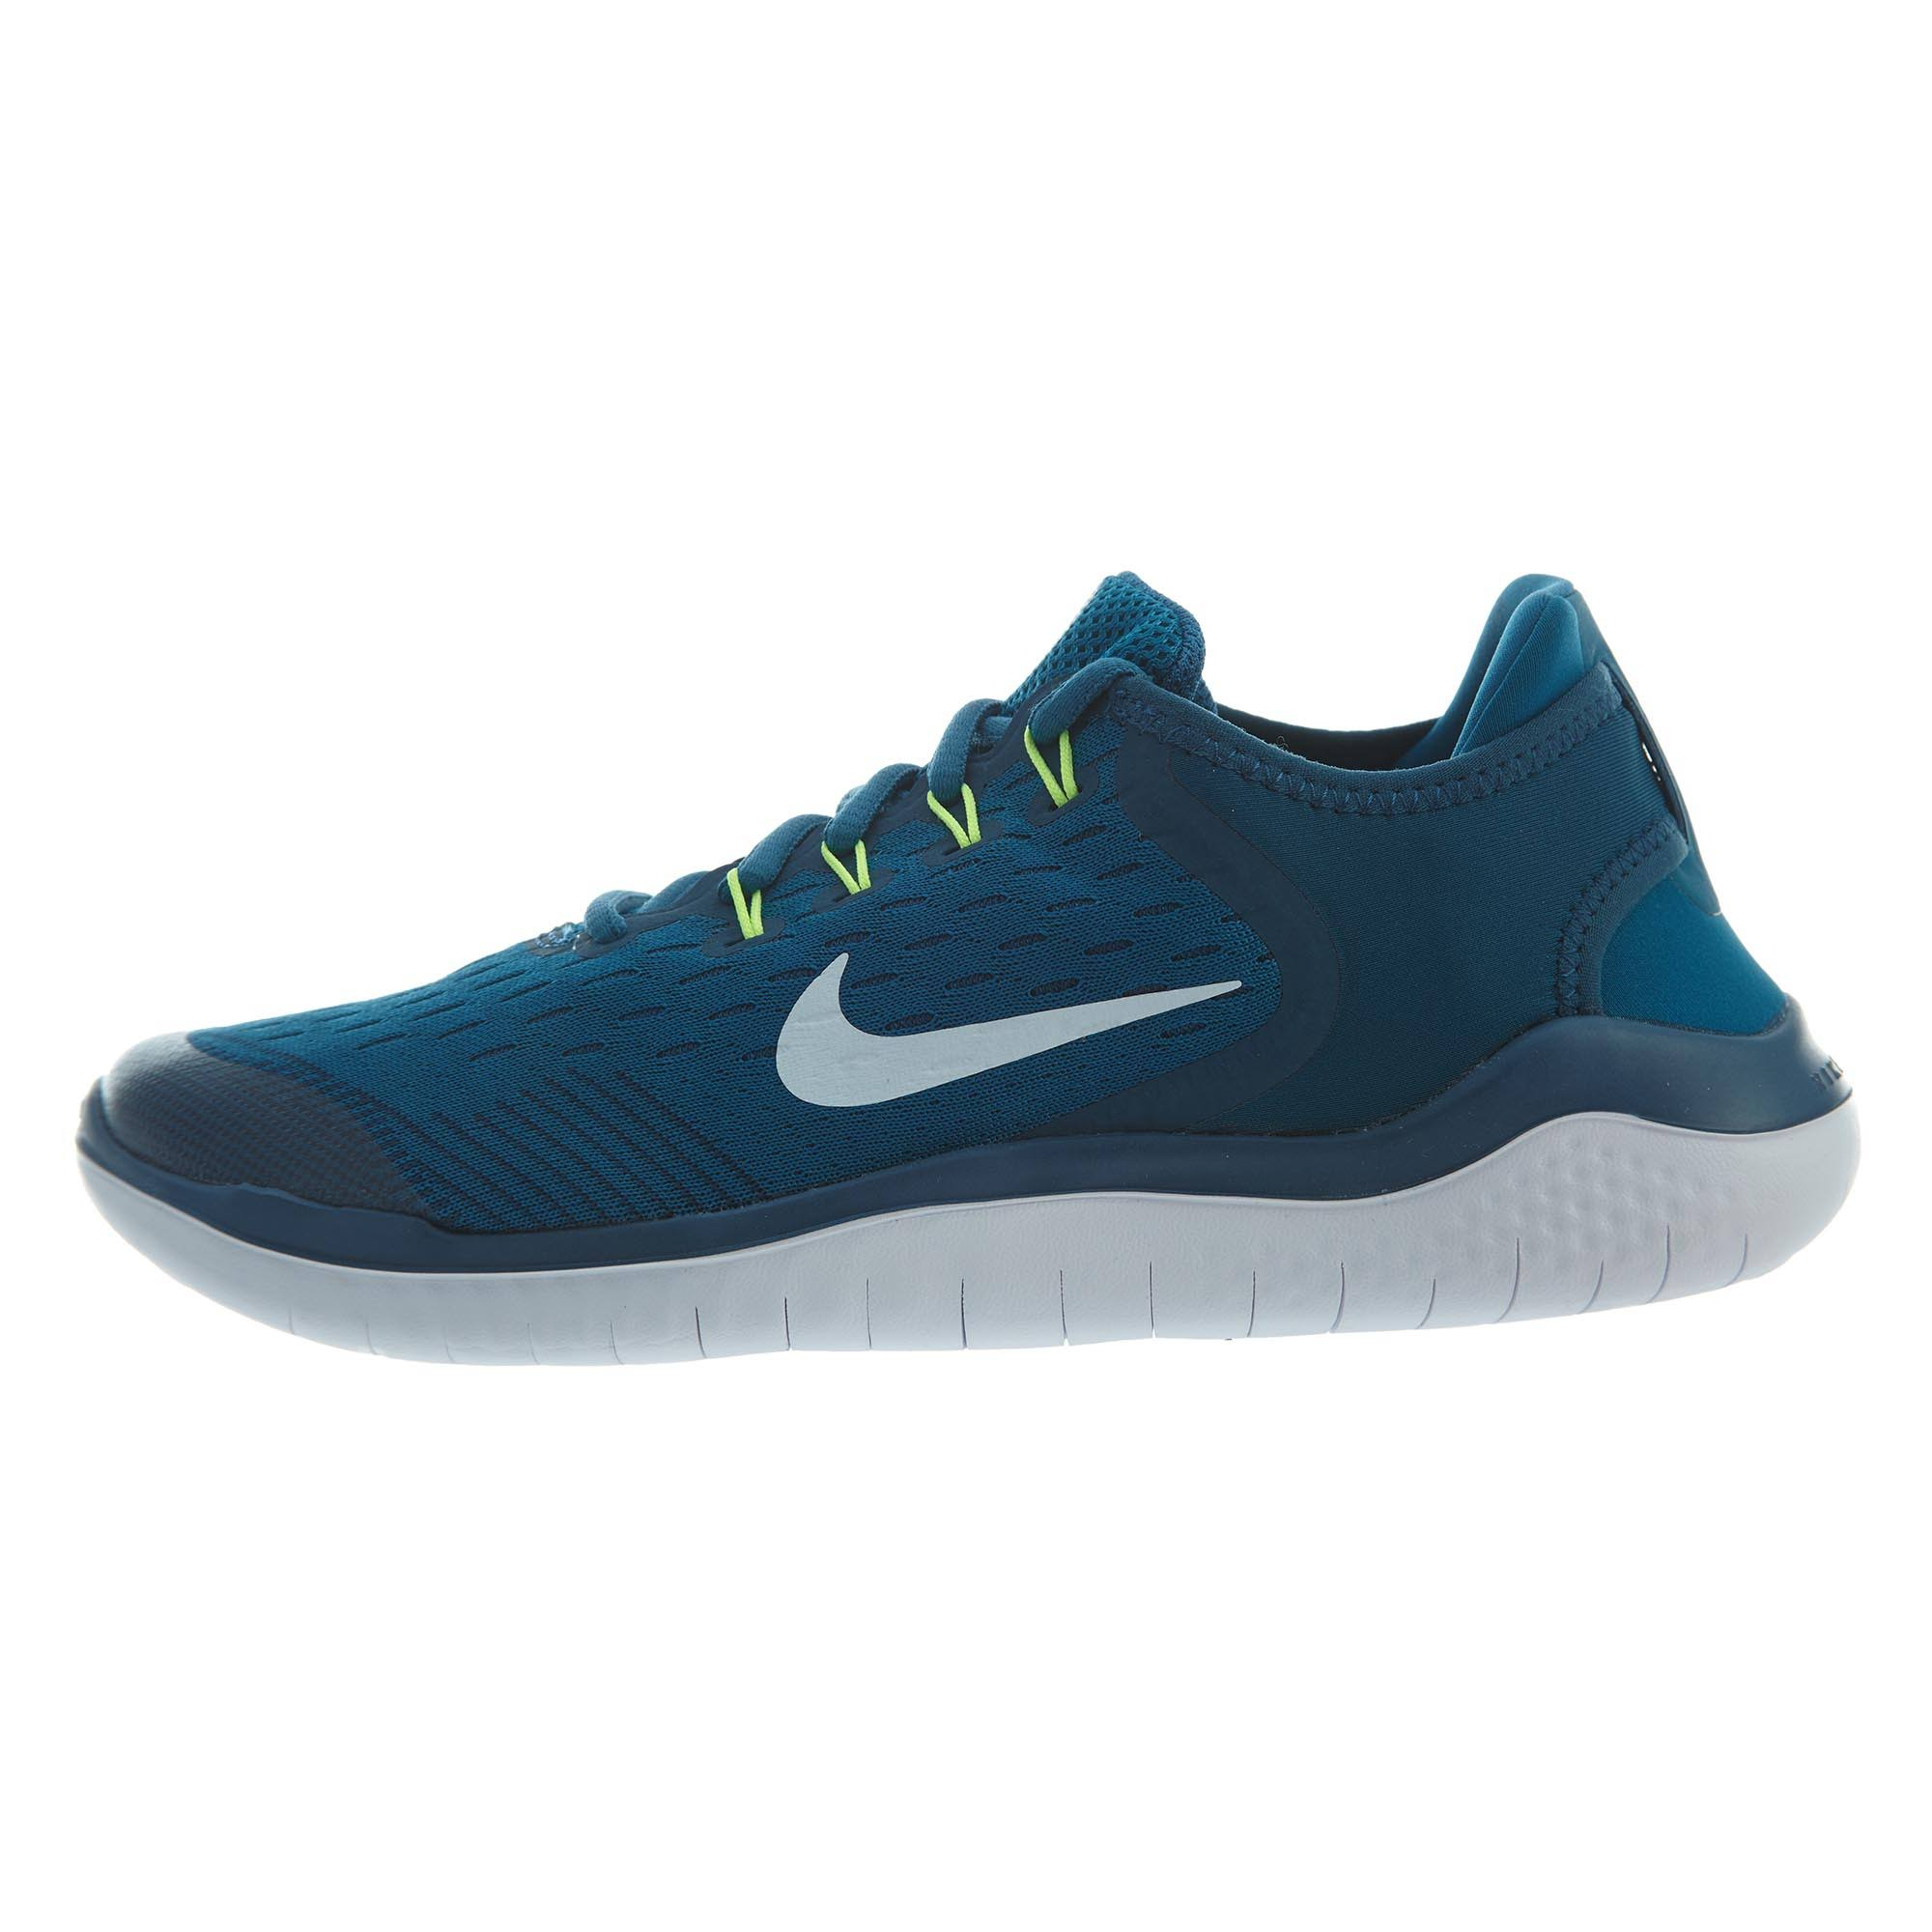 Style 402 2018 Blue Große Rn Force Free Ah3451 Nike Kinder nUqSwXqF